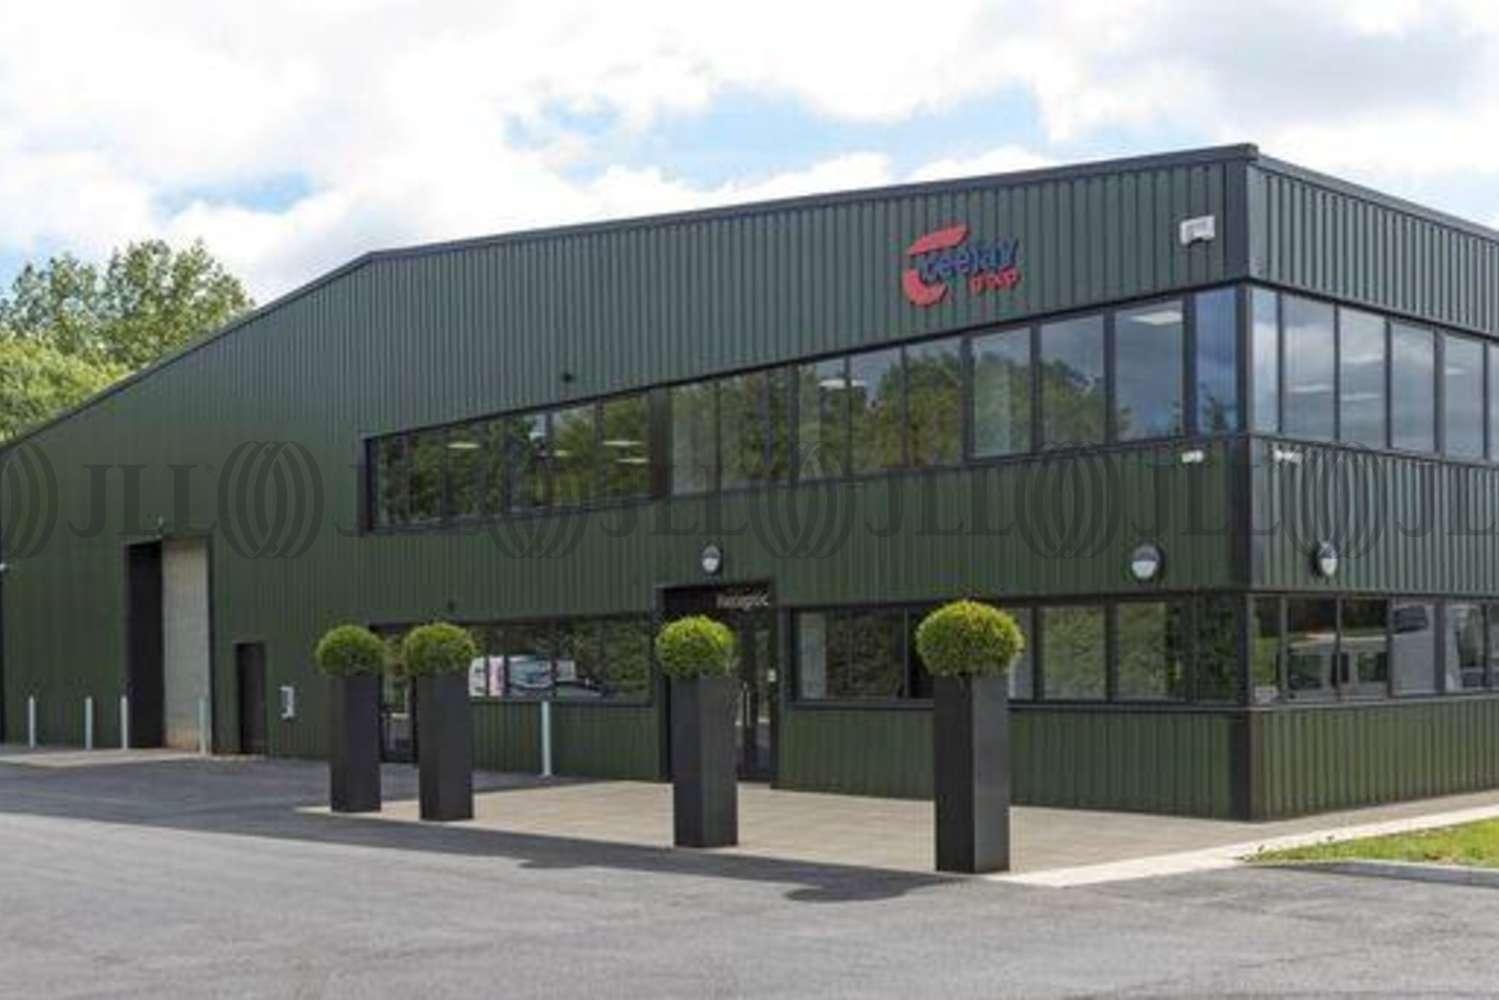 Industrial Southampton, SO32 2JQ - Ceejay Systems/Warwick Trailers - 1